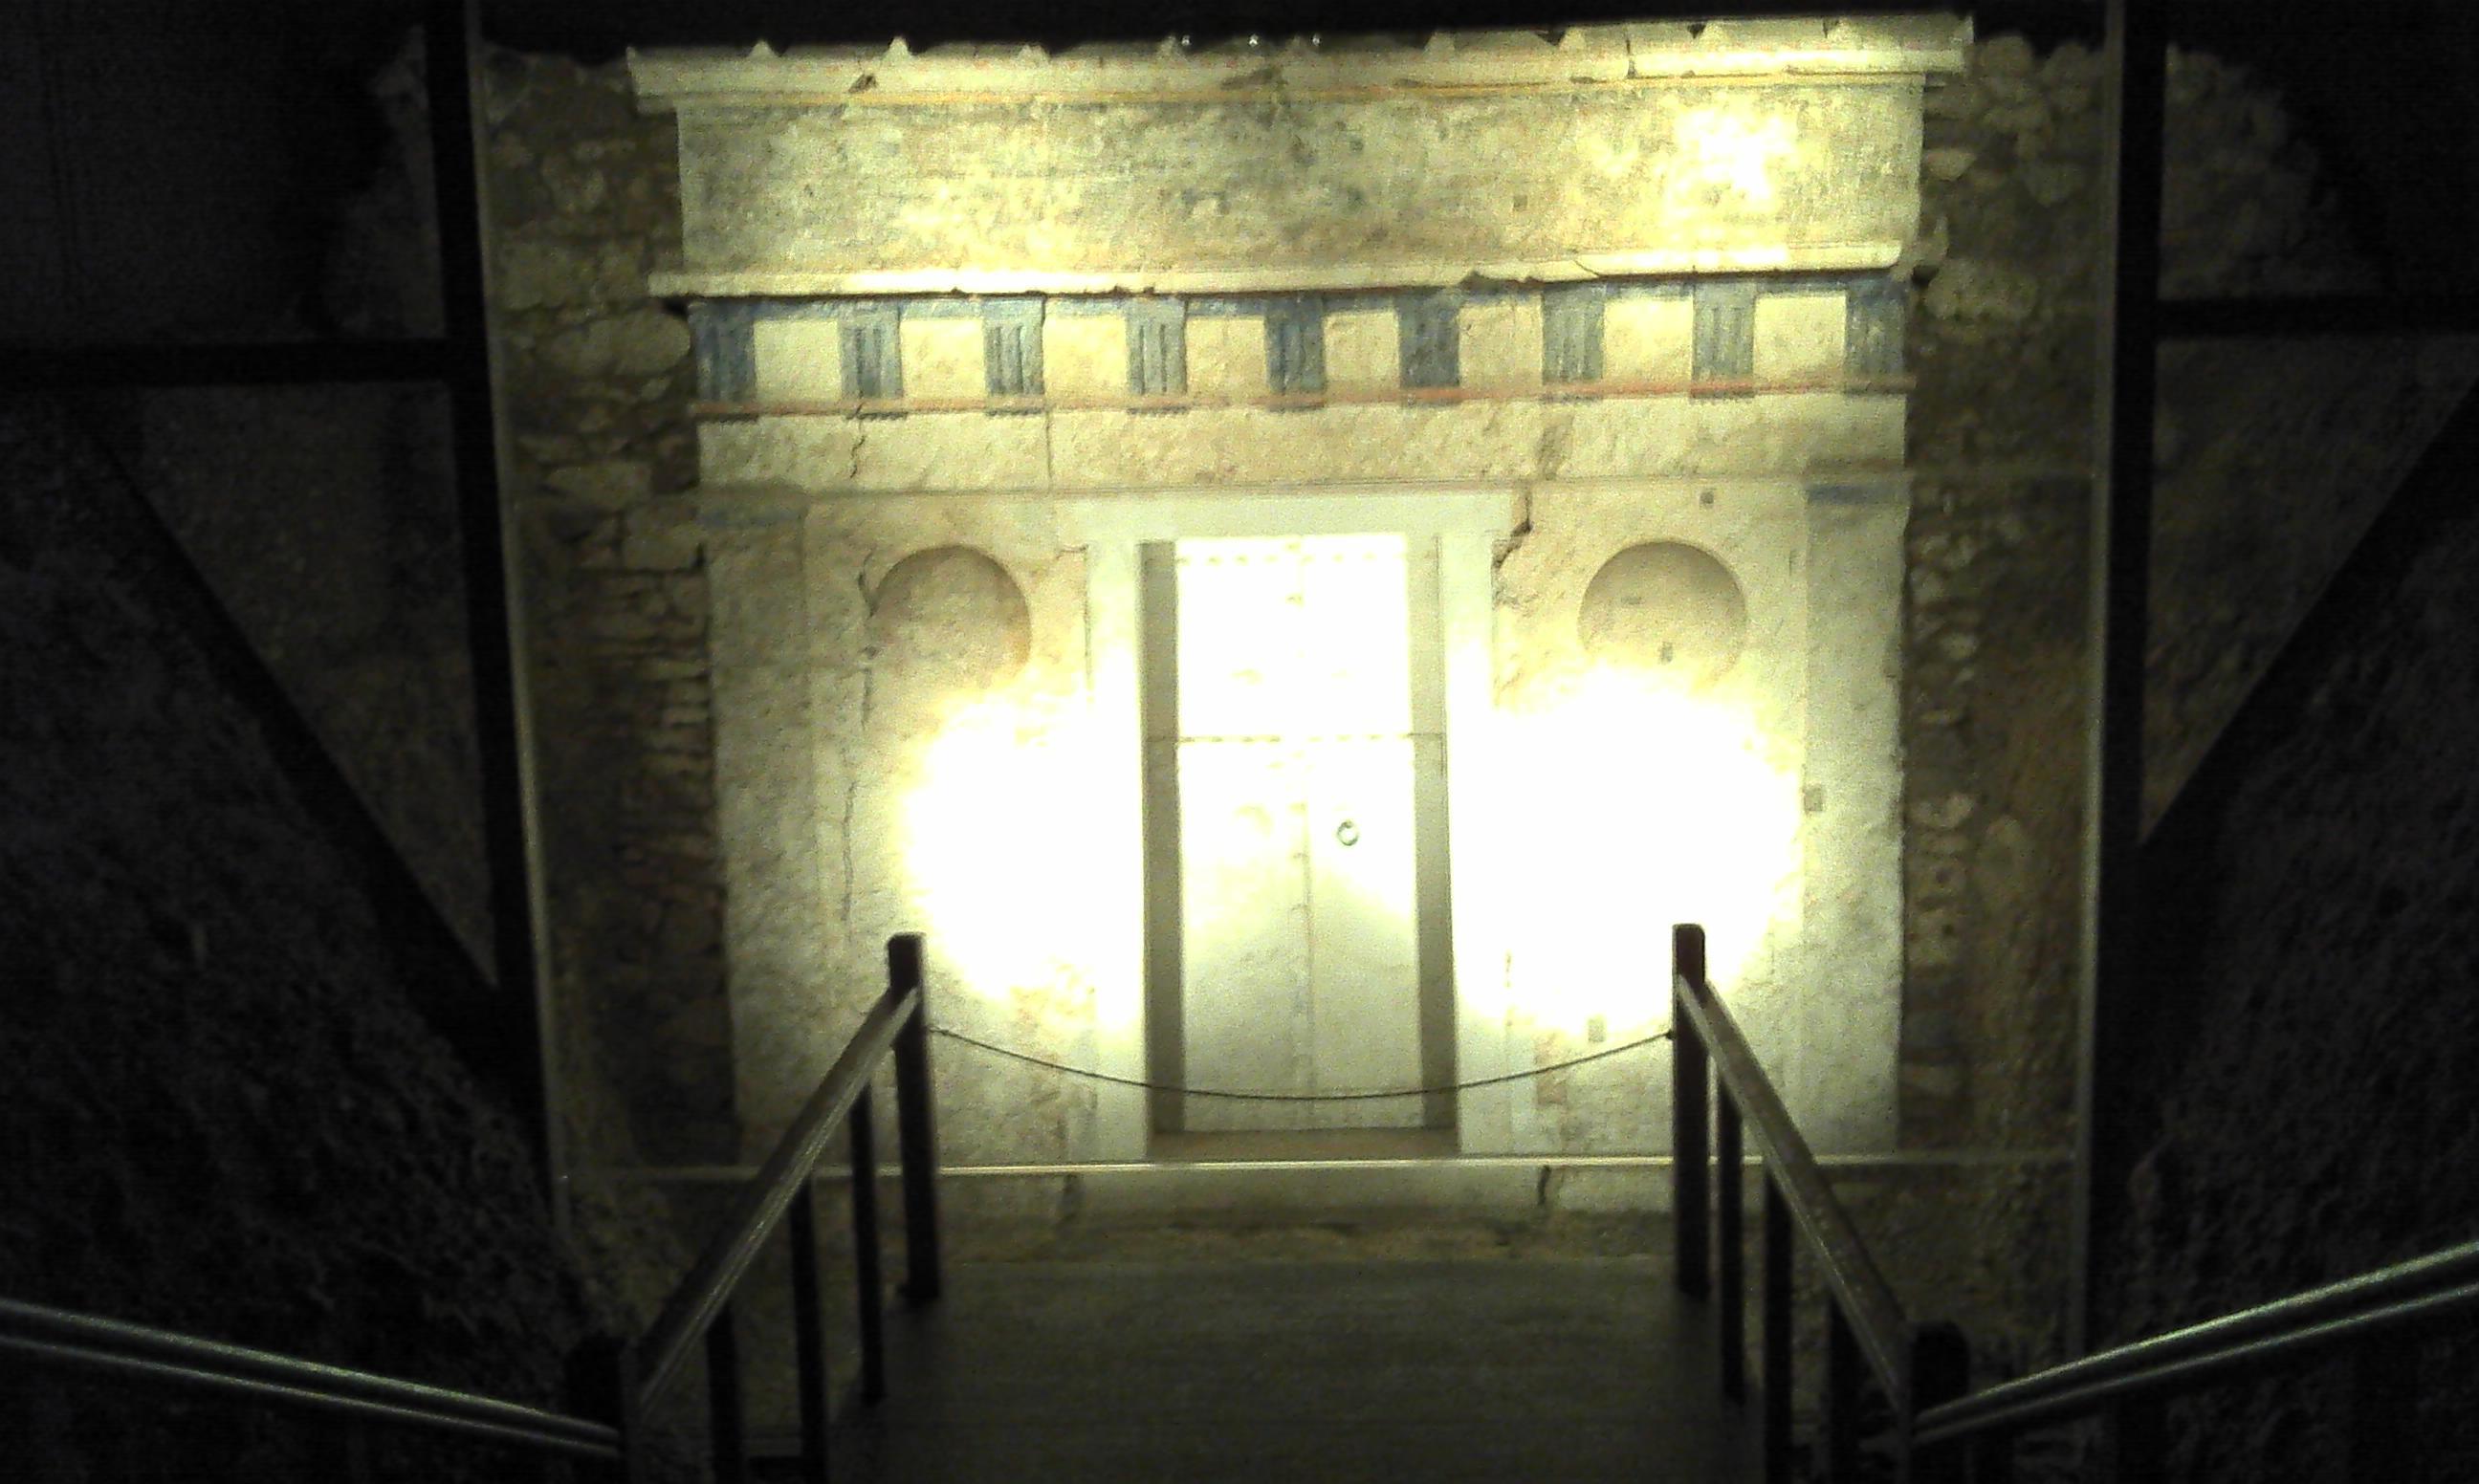 File:Tomb III Vergina.jpg - Wikimedia Commons